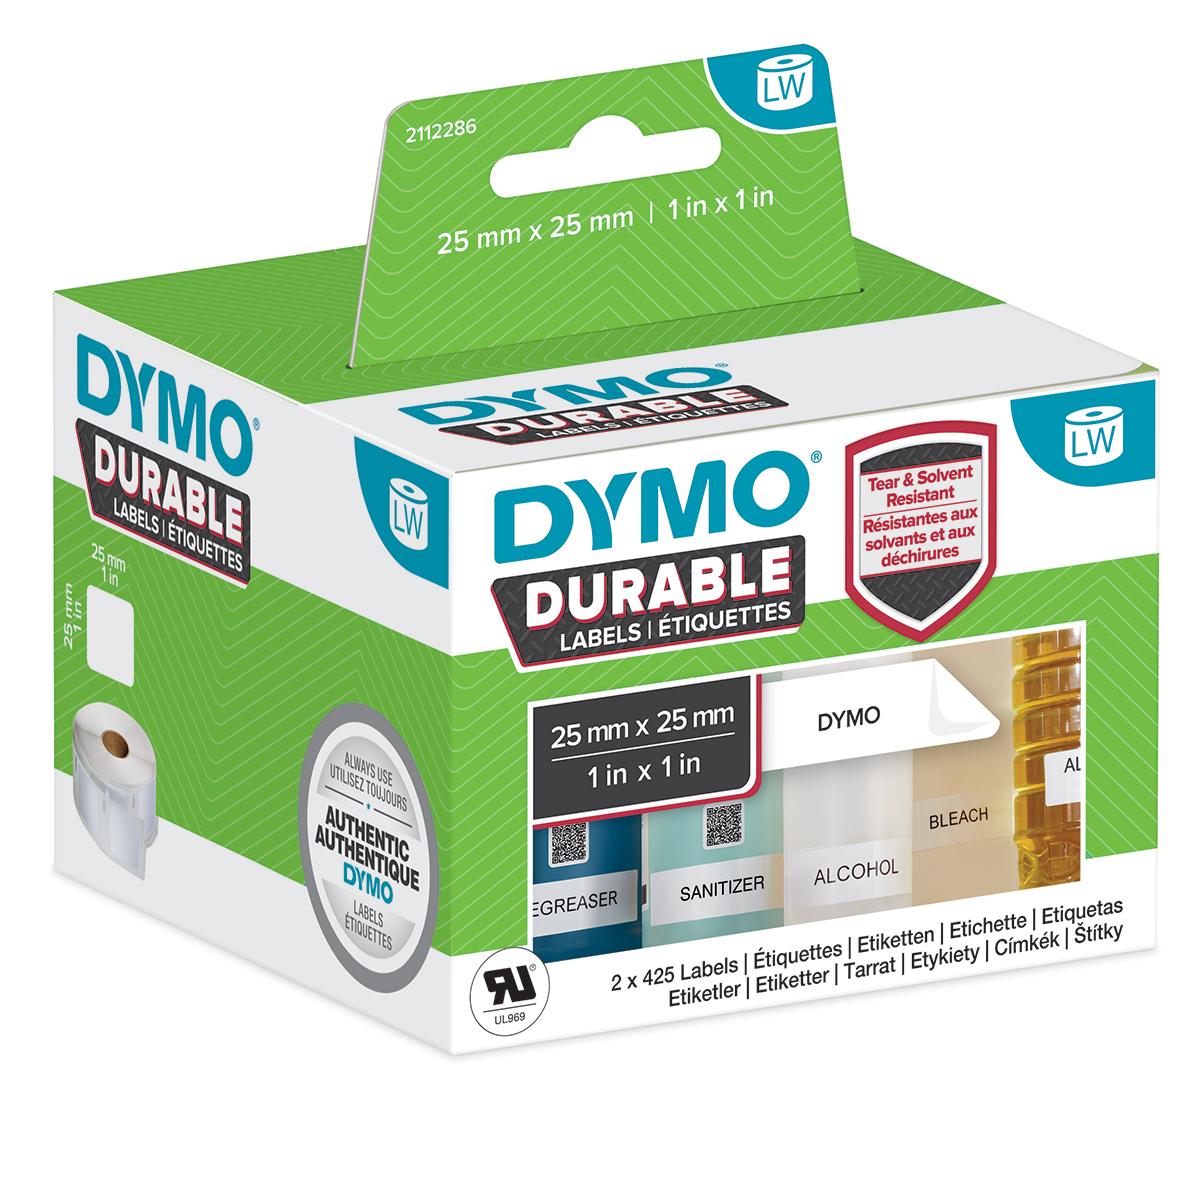 Dymo 2112286 LW Durable square multi-purpose 25mm x 25mm Black on White